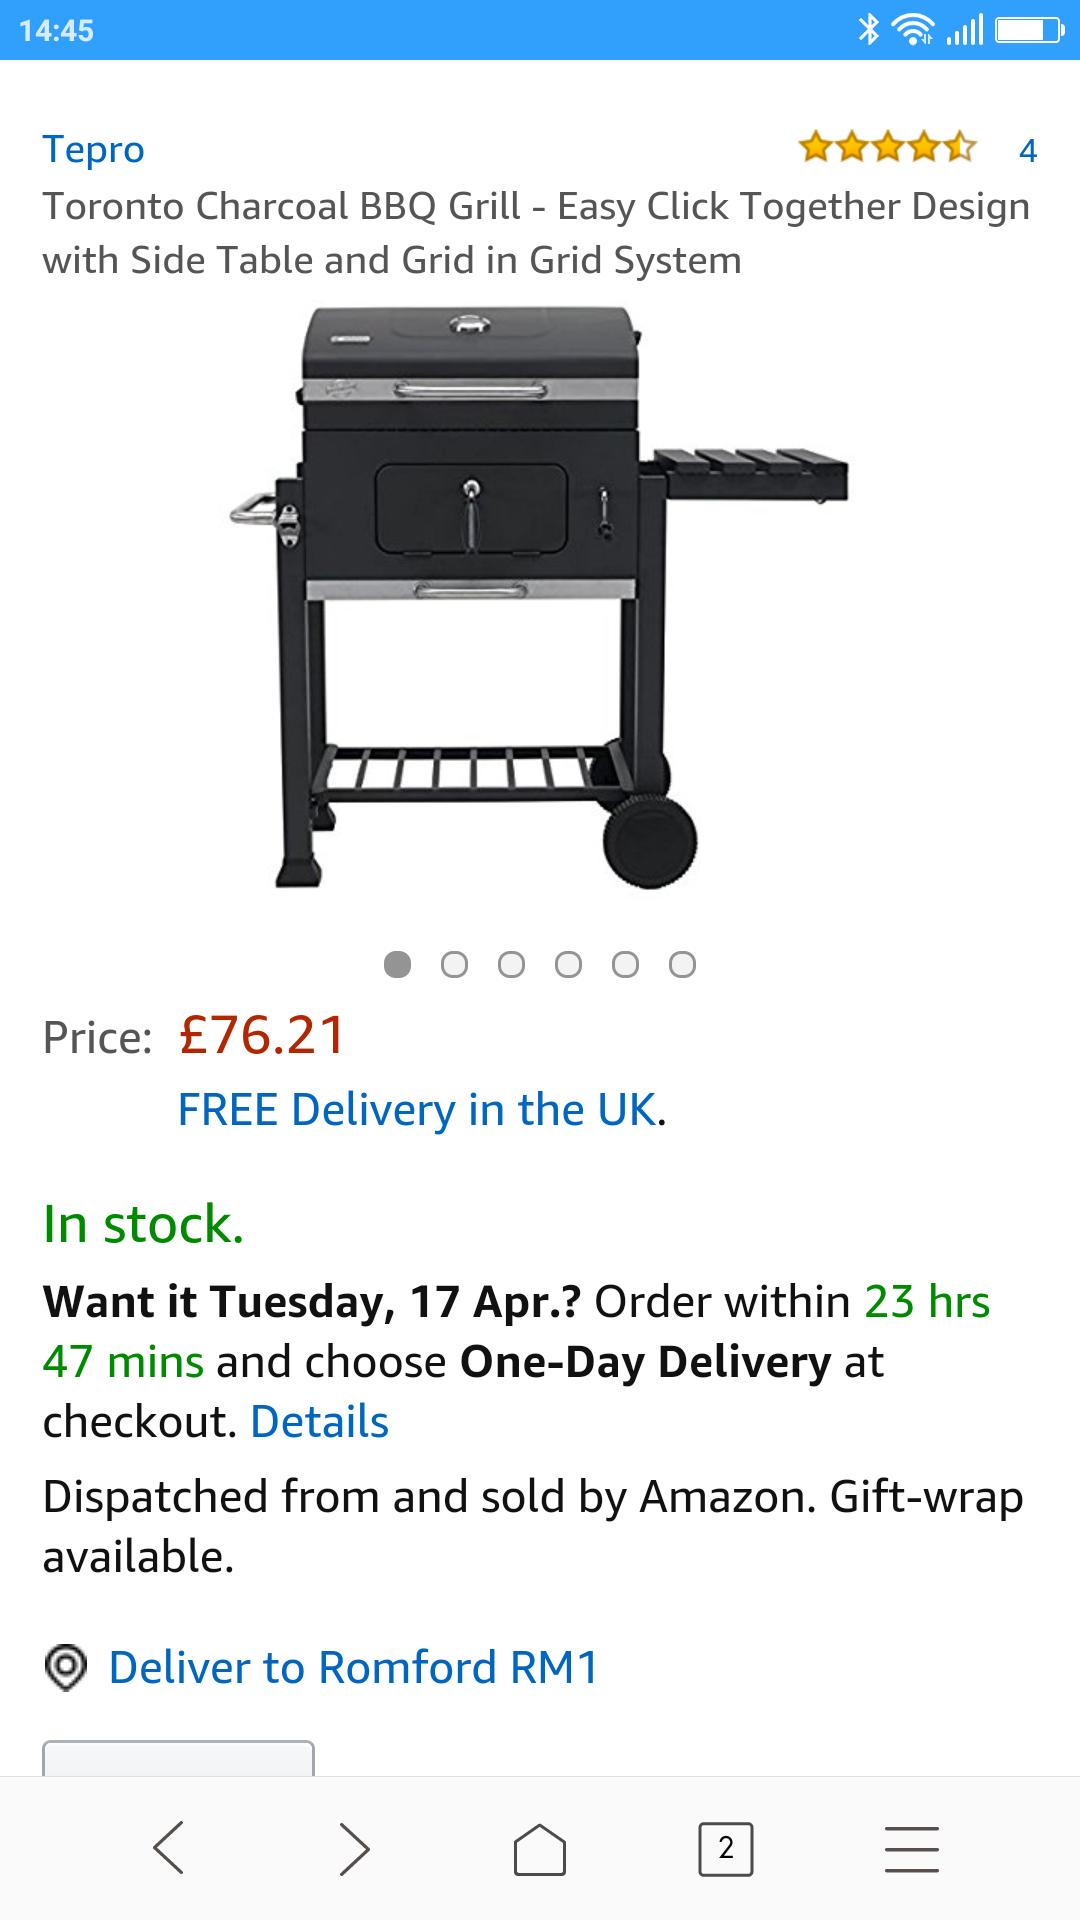 Tepro Toronto charcoal BBQ grill £75.62 @ Amazon